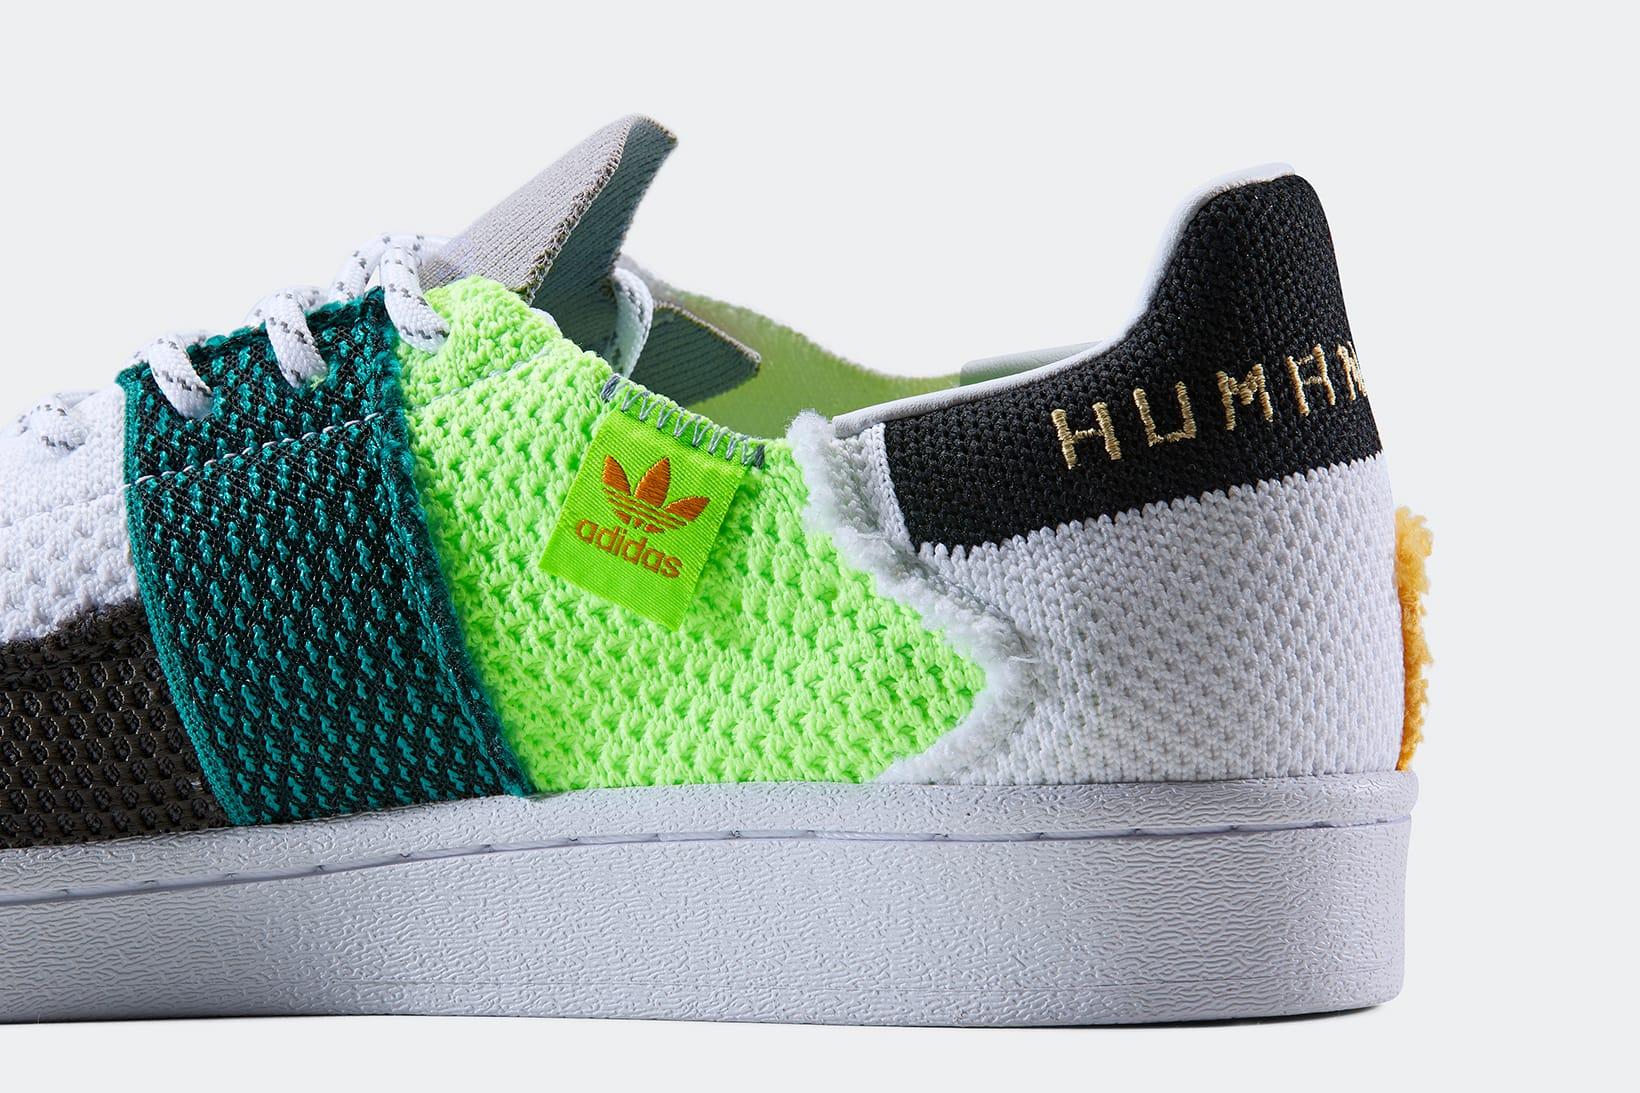 Pharrell x adidas Originals Superstar